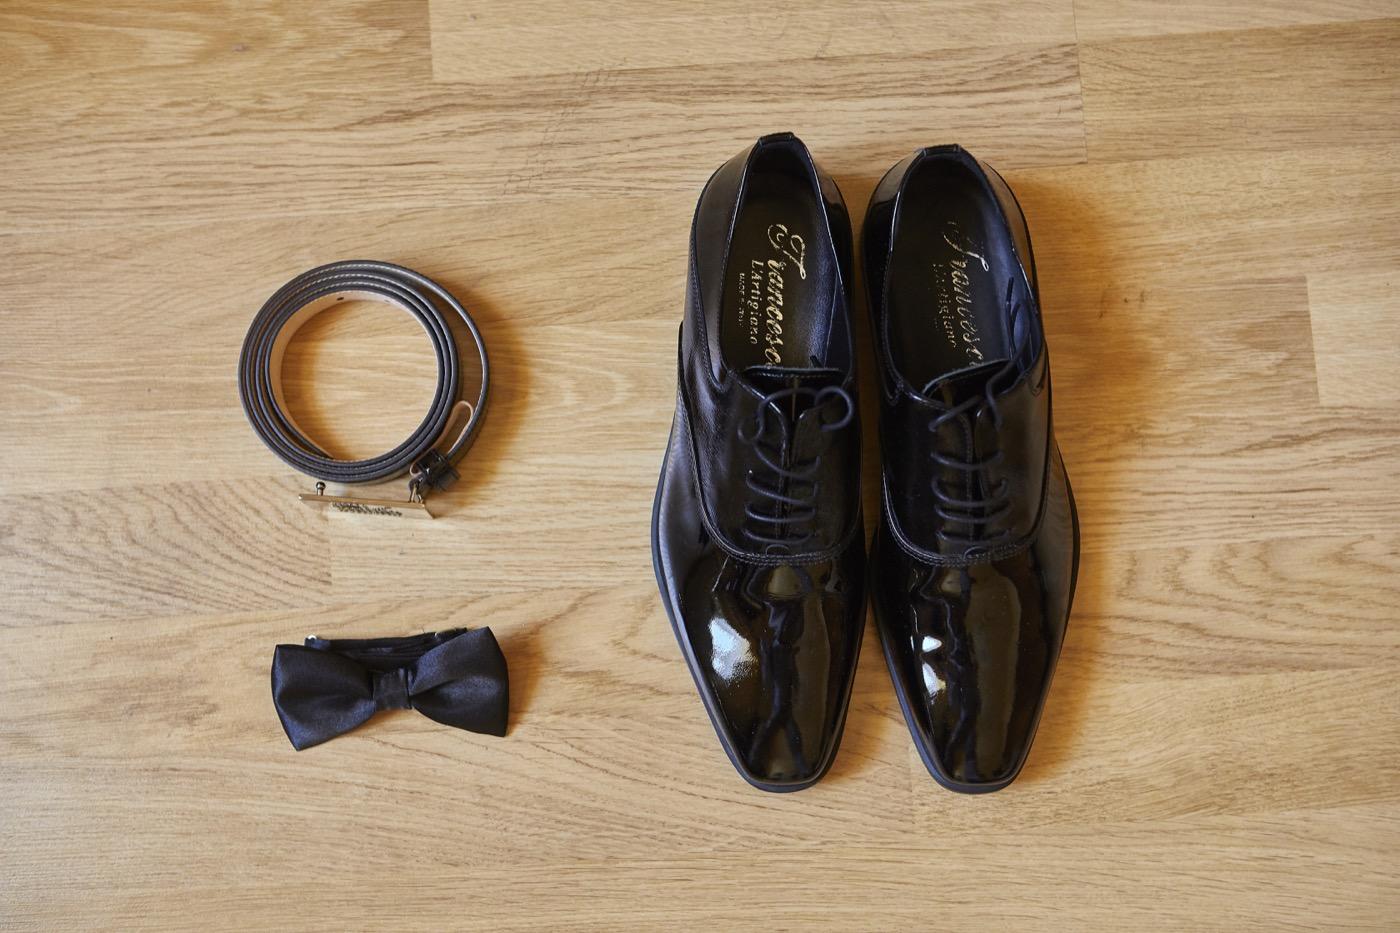 Claudio-Coppola-wedding-photographer-la-scuderia-eventi-preparativi-la-rosetta-perugia-2